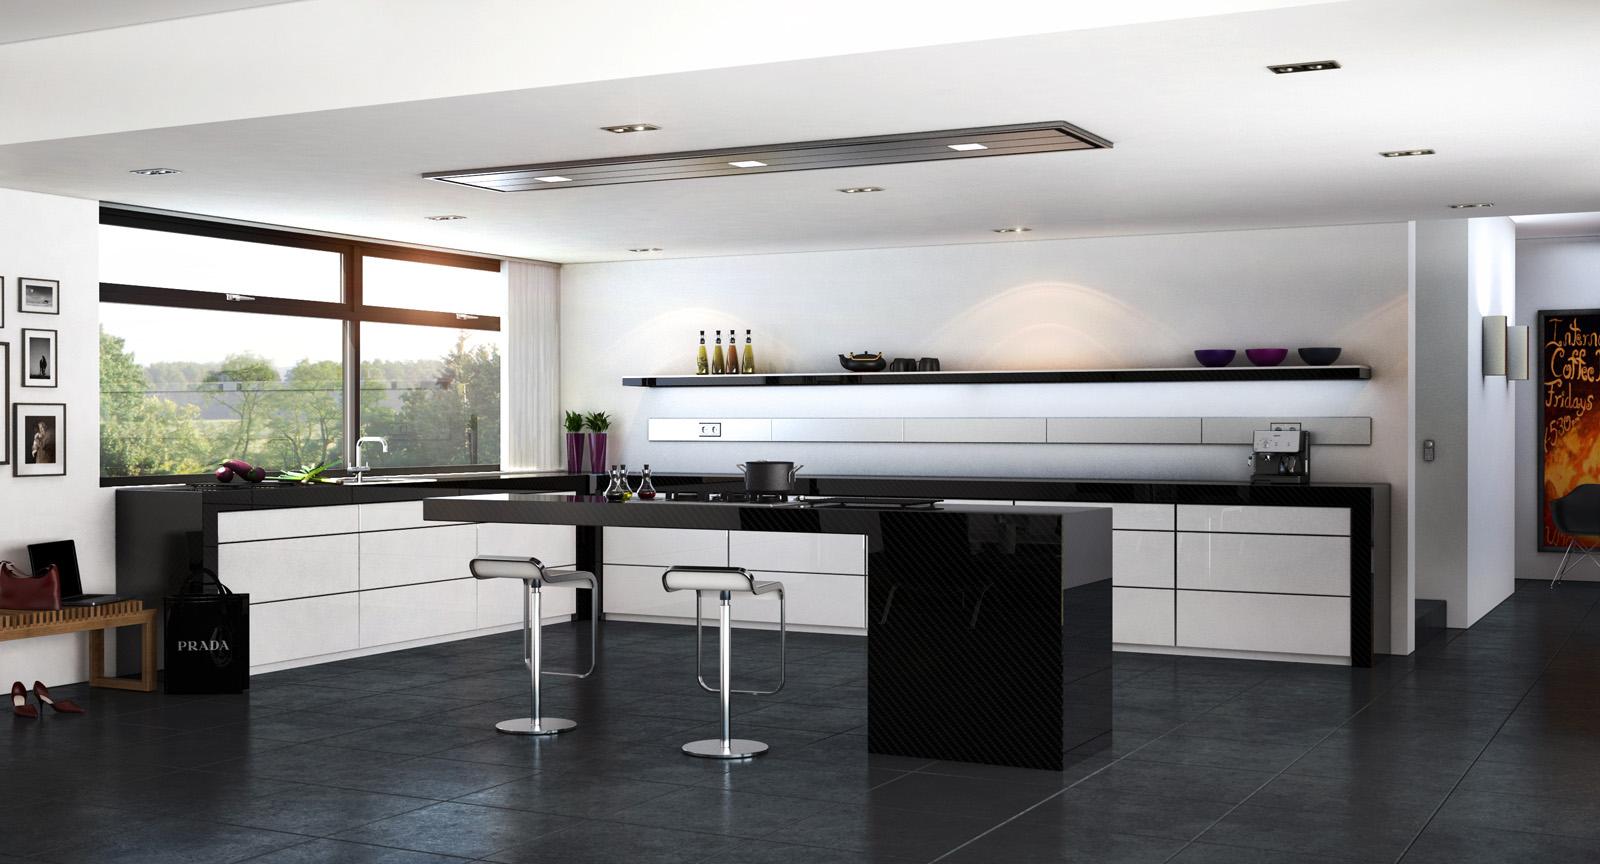 Perfect Carbon Kitchen Images - Best Kitchen Ideas - i-contain.com